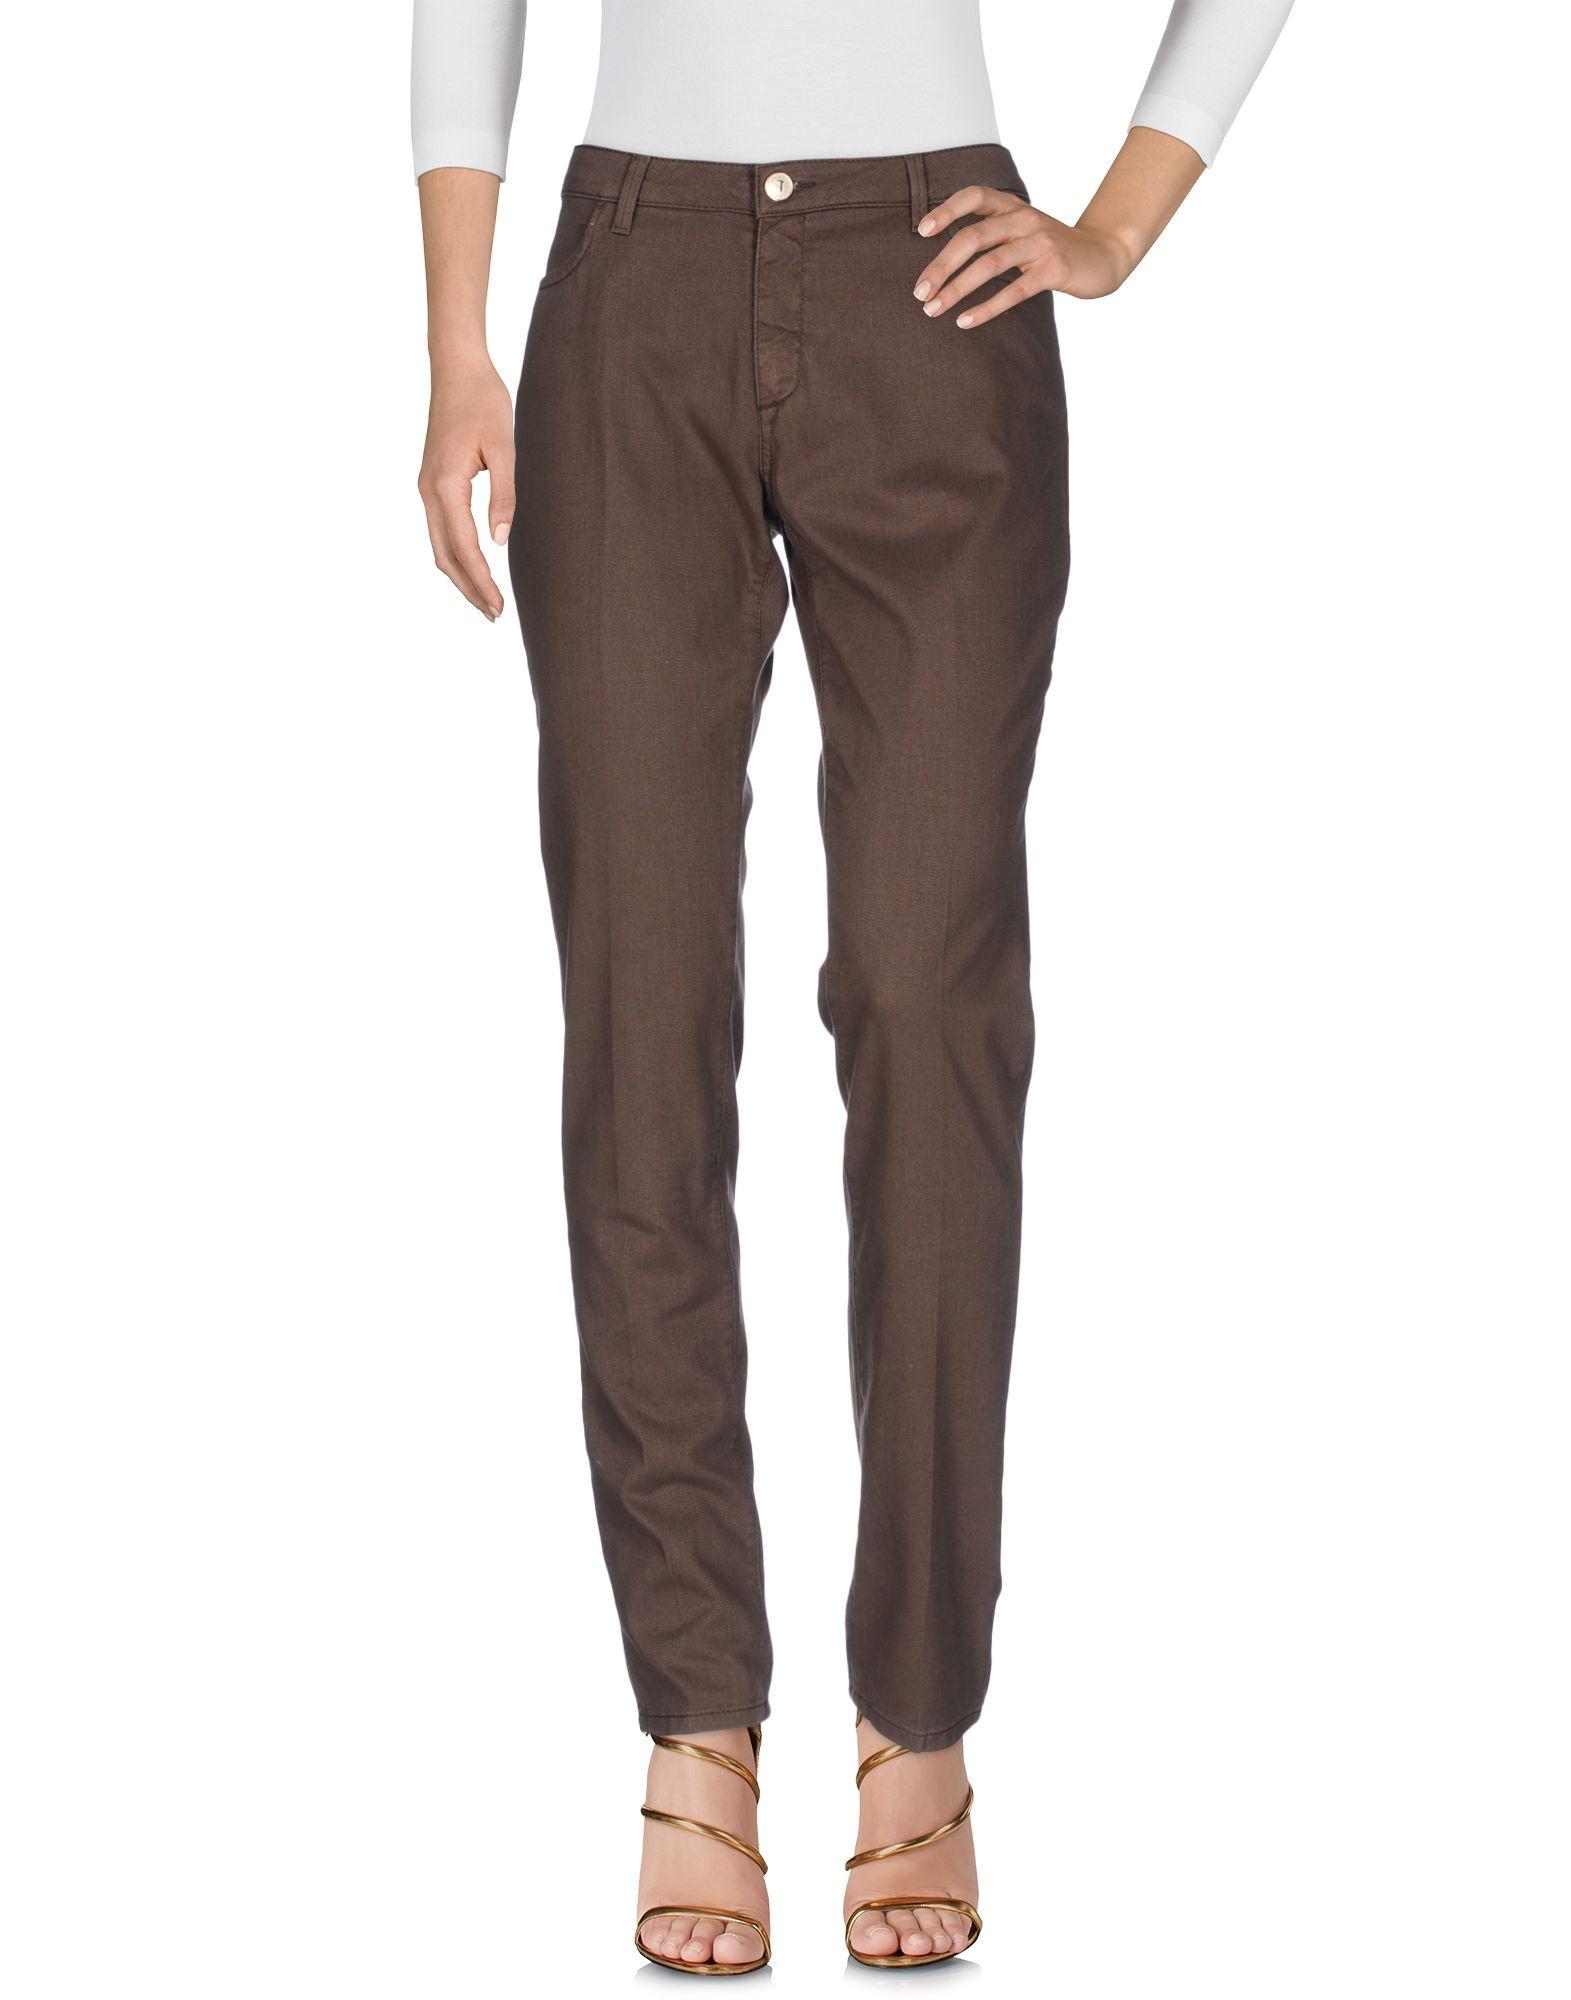 TRUSSARDI JEANS Damen Jeanshose Farbe Dunkelbraun Größe 9 jetztbilligerkaufen